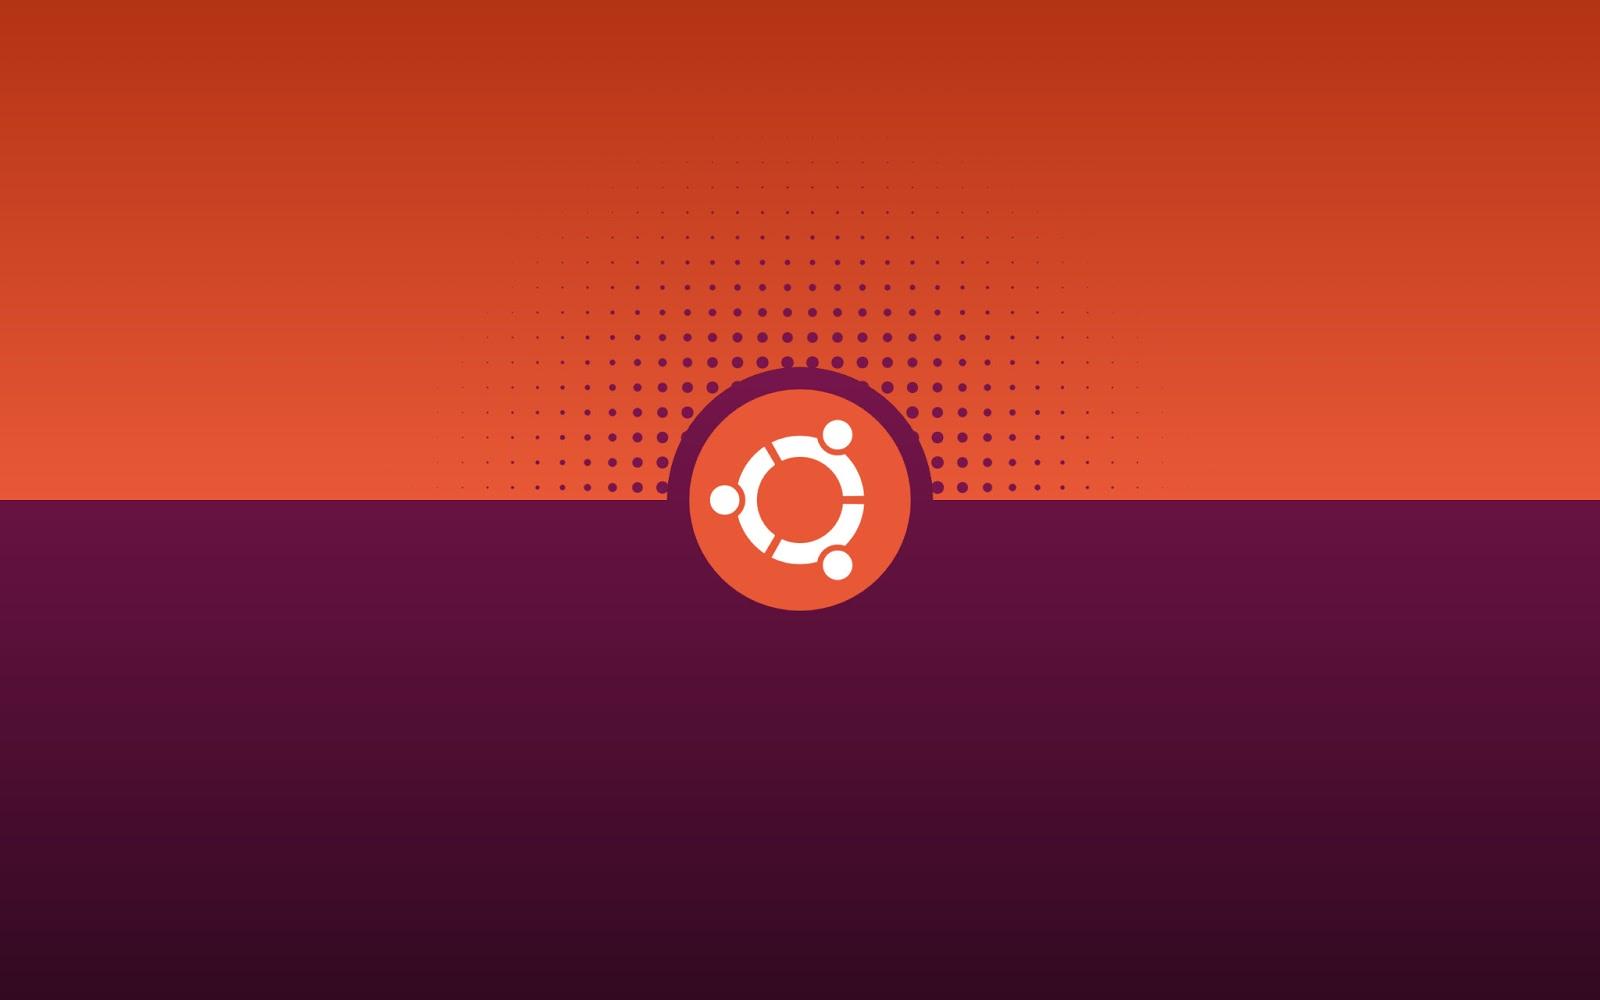 Ubuntu 3D Logos Wallpapers HD